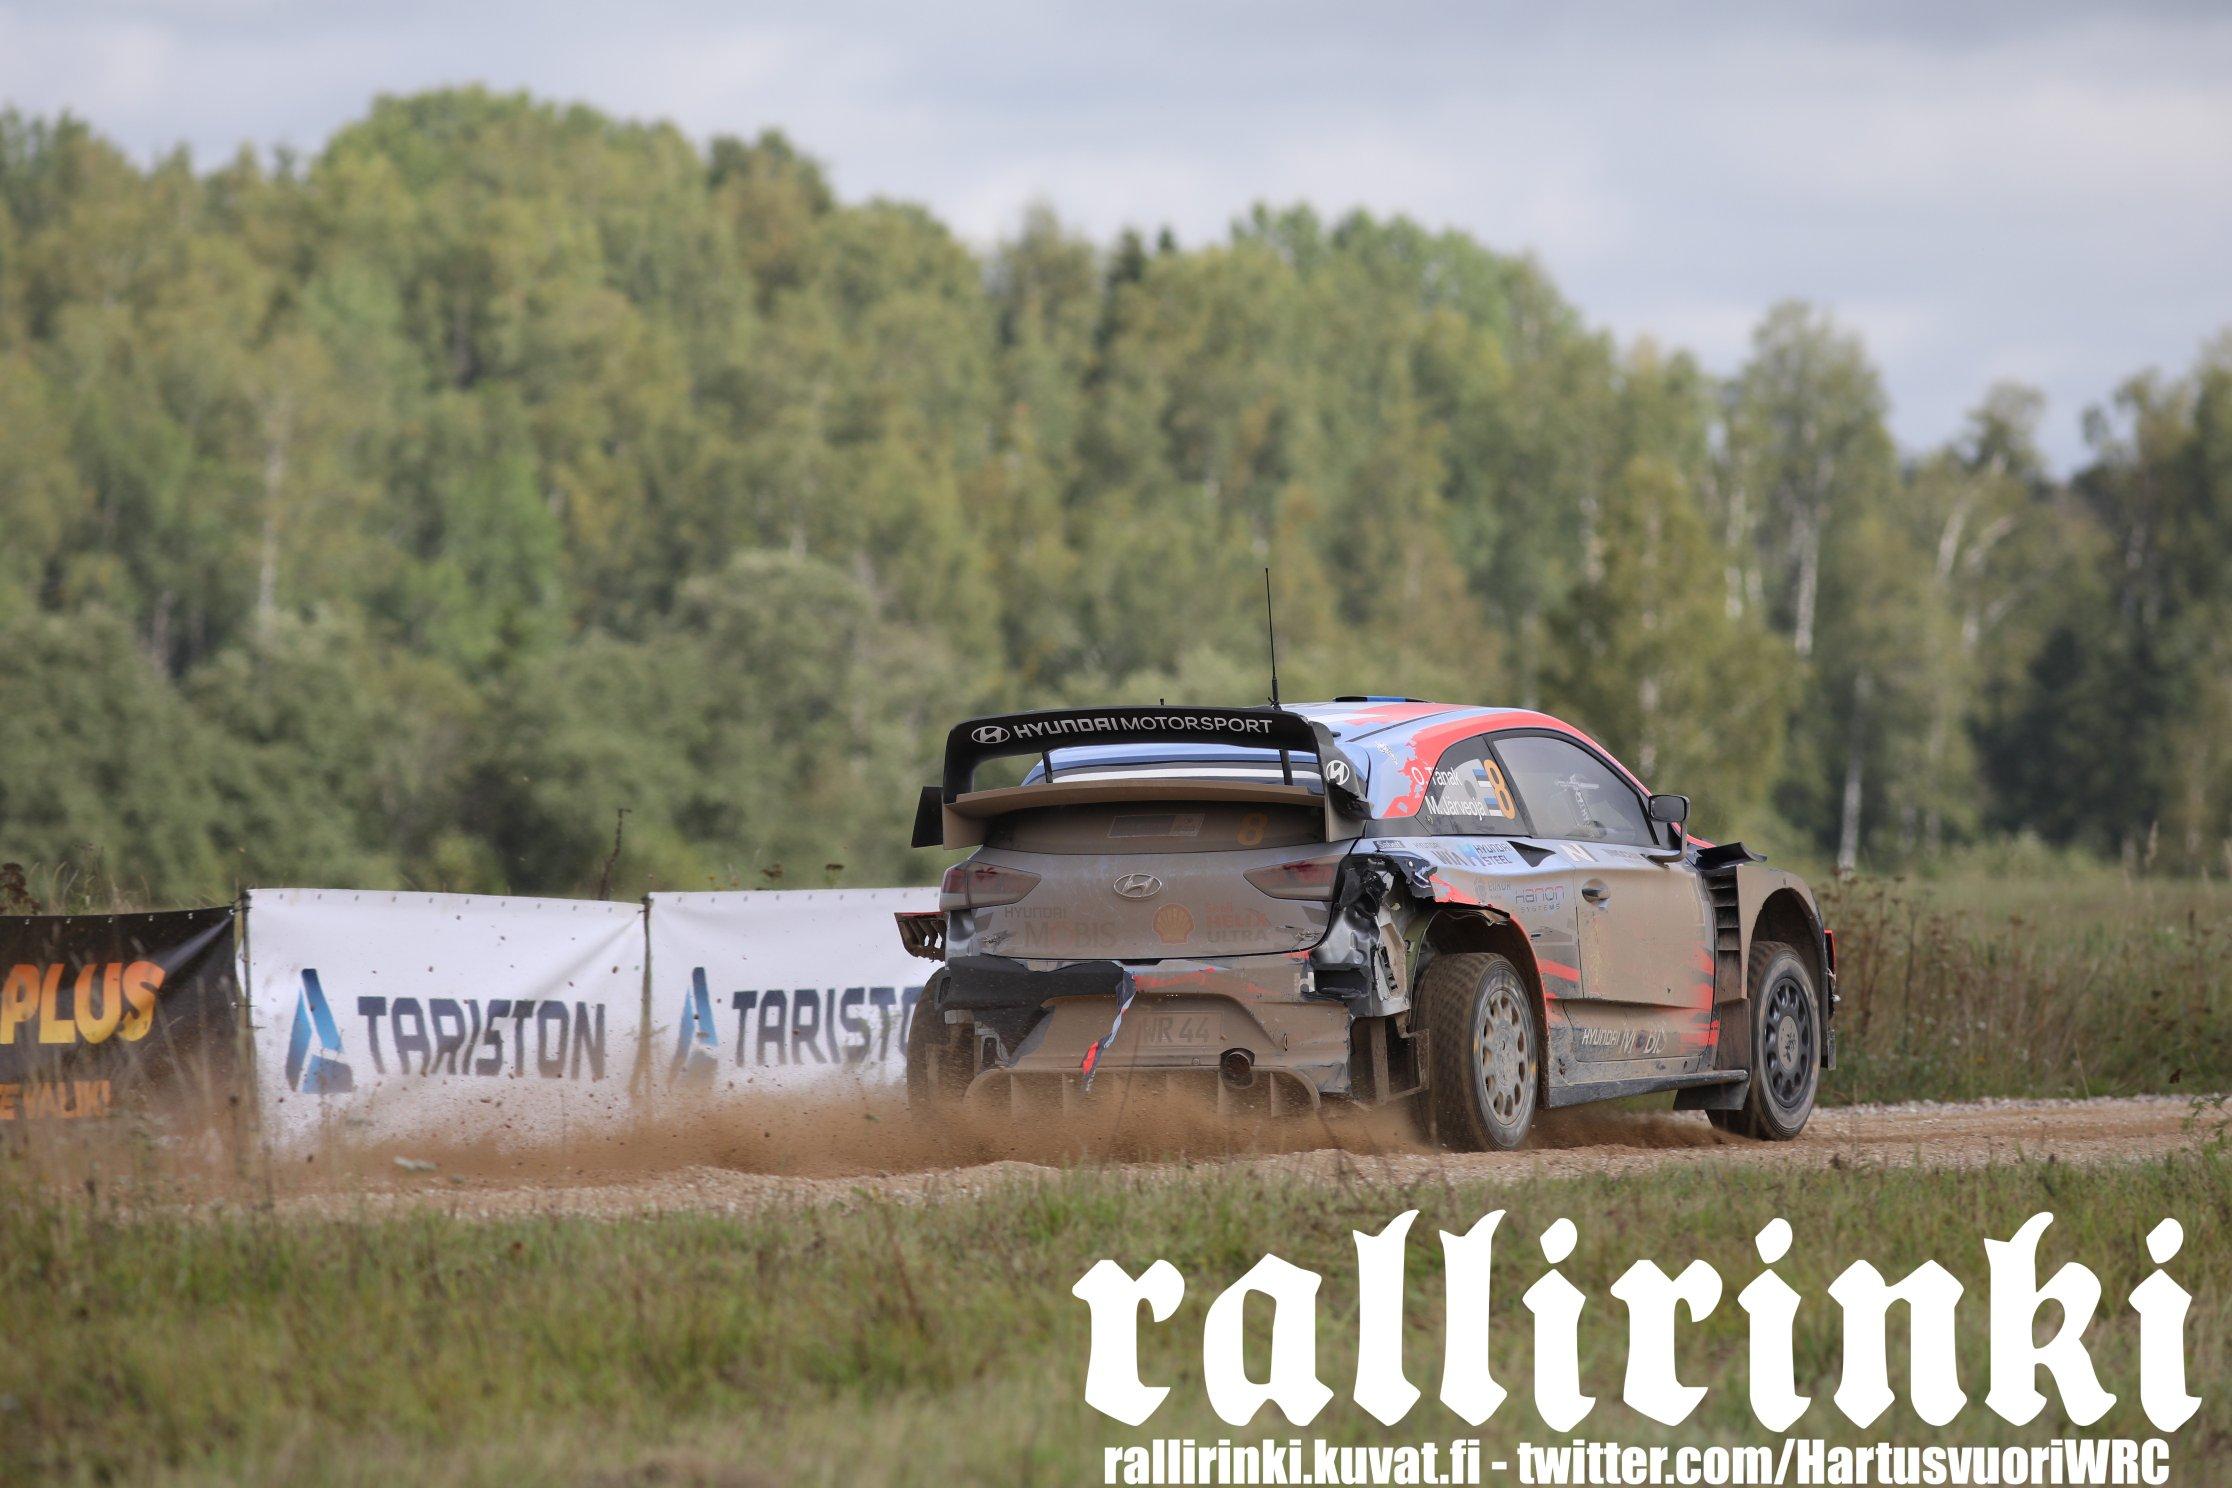 WRC: 10º Rallye Estonia [4-6 Septiembre] - Página 6 EhOGlIKXkAEgoFb?format=jpg&name=4096x4096